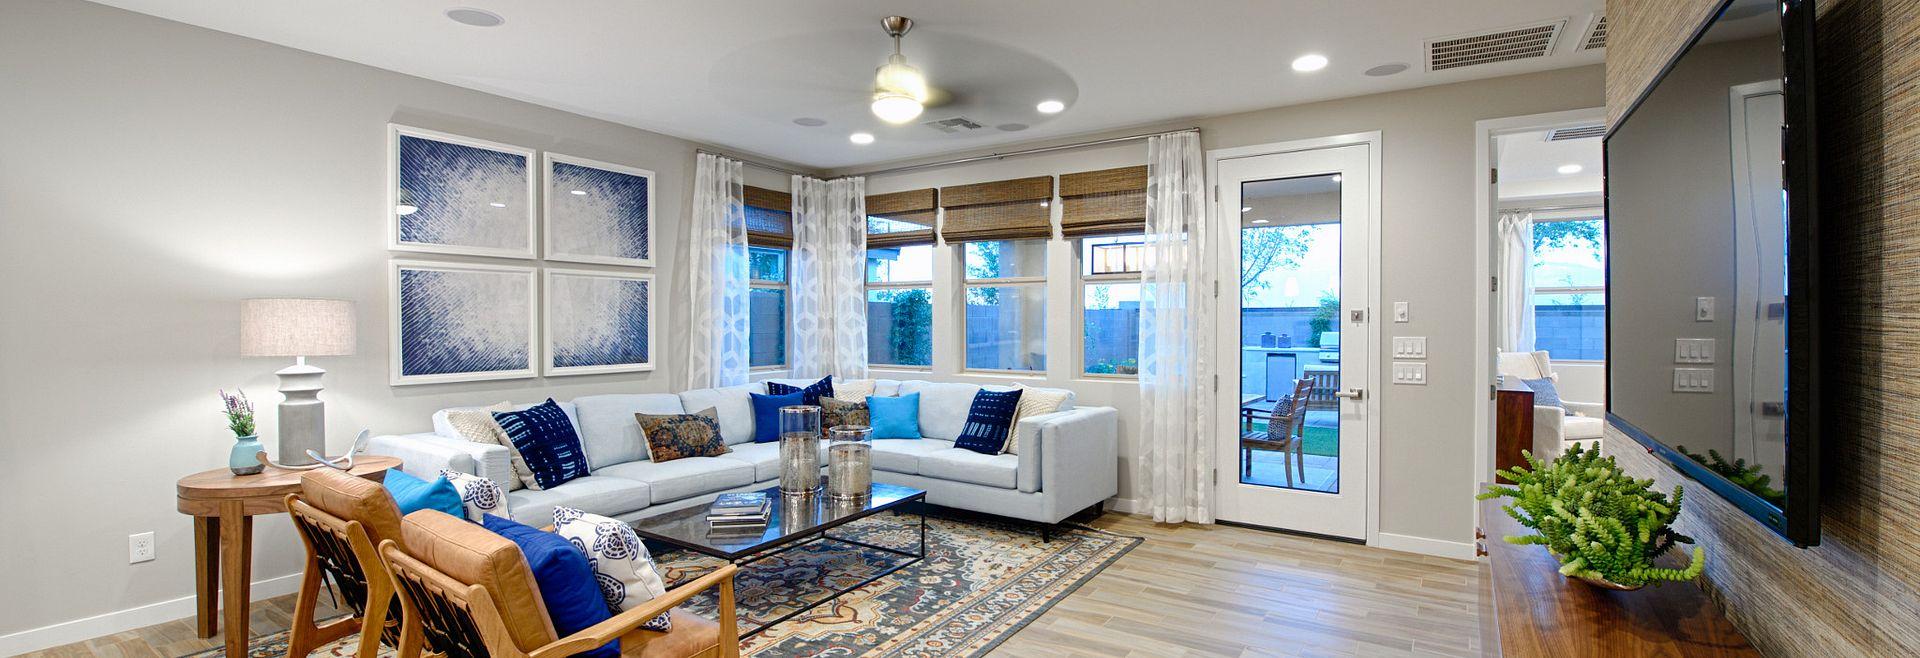 Plan 4012 Living Room